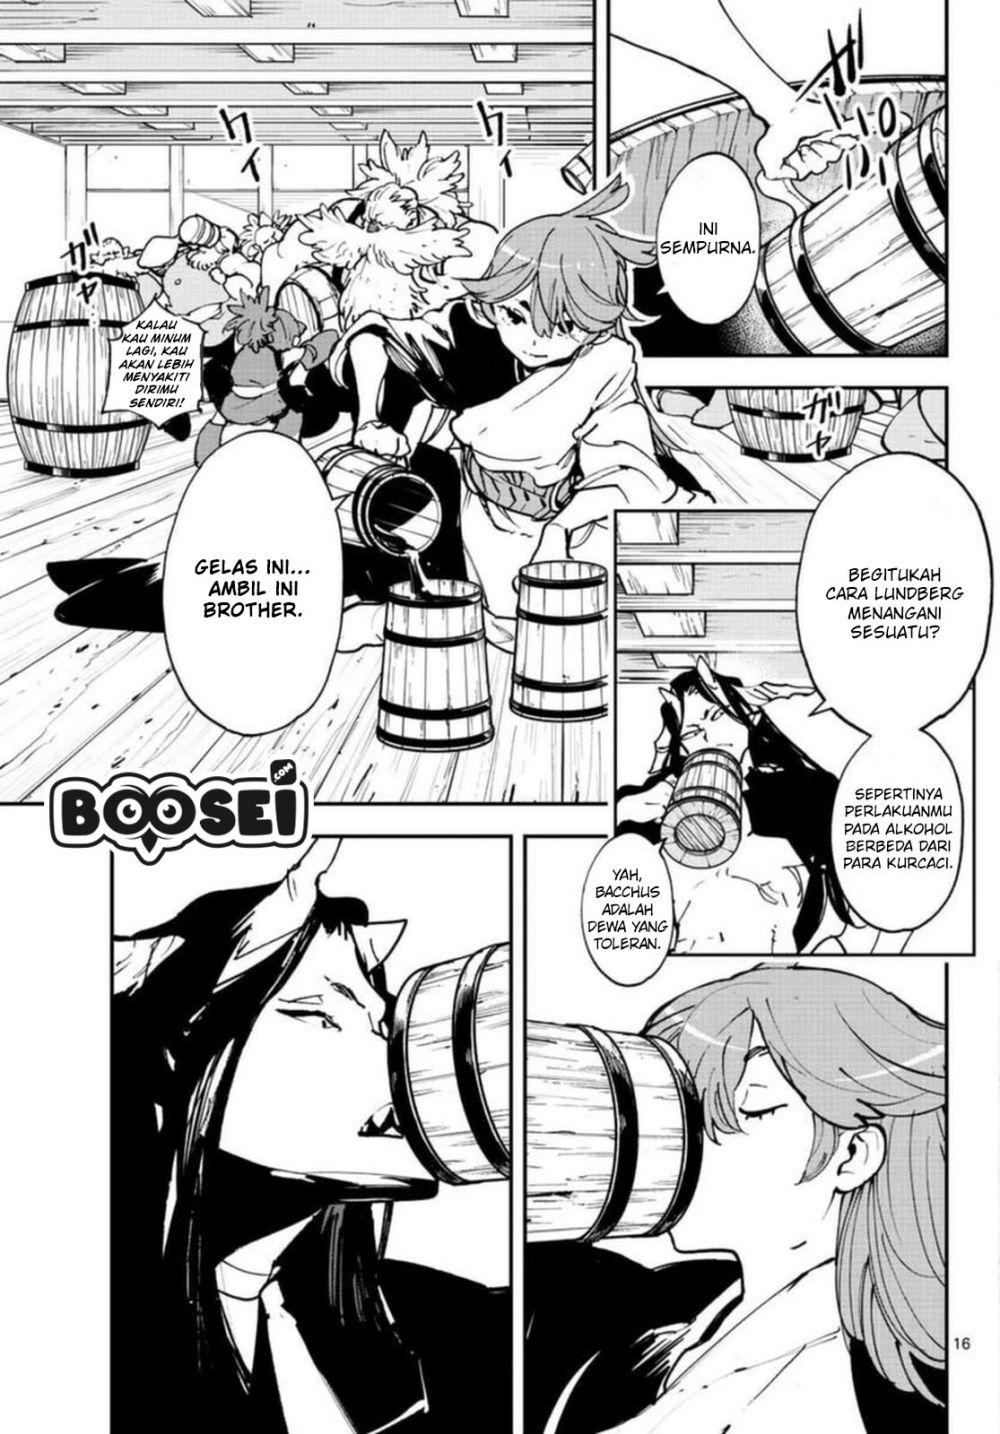 Ninkyou Tensei: Isekai no Yakuzahime: Chapter 24.1 - Page 17